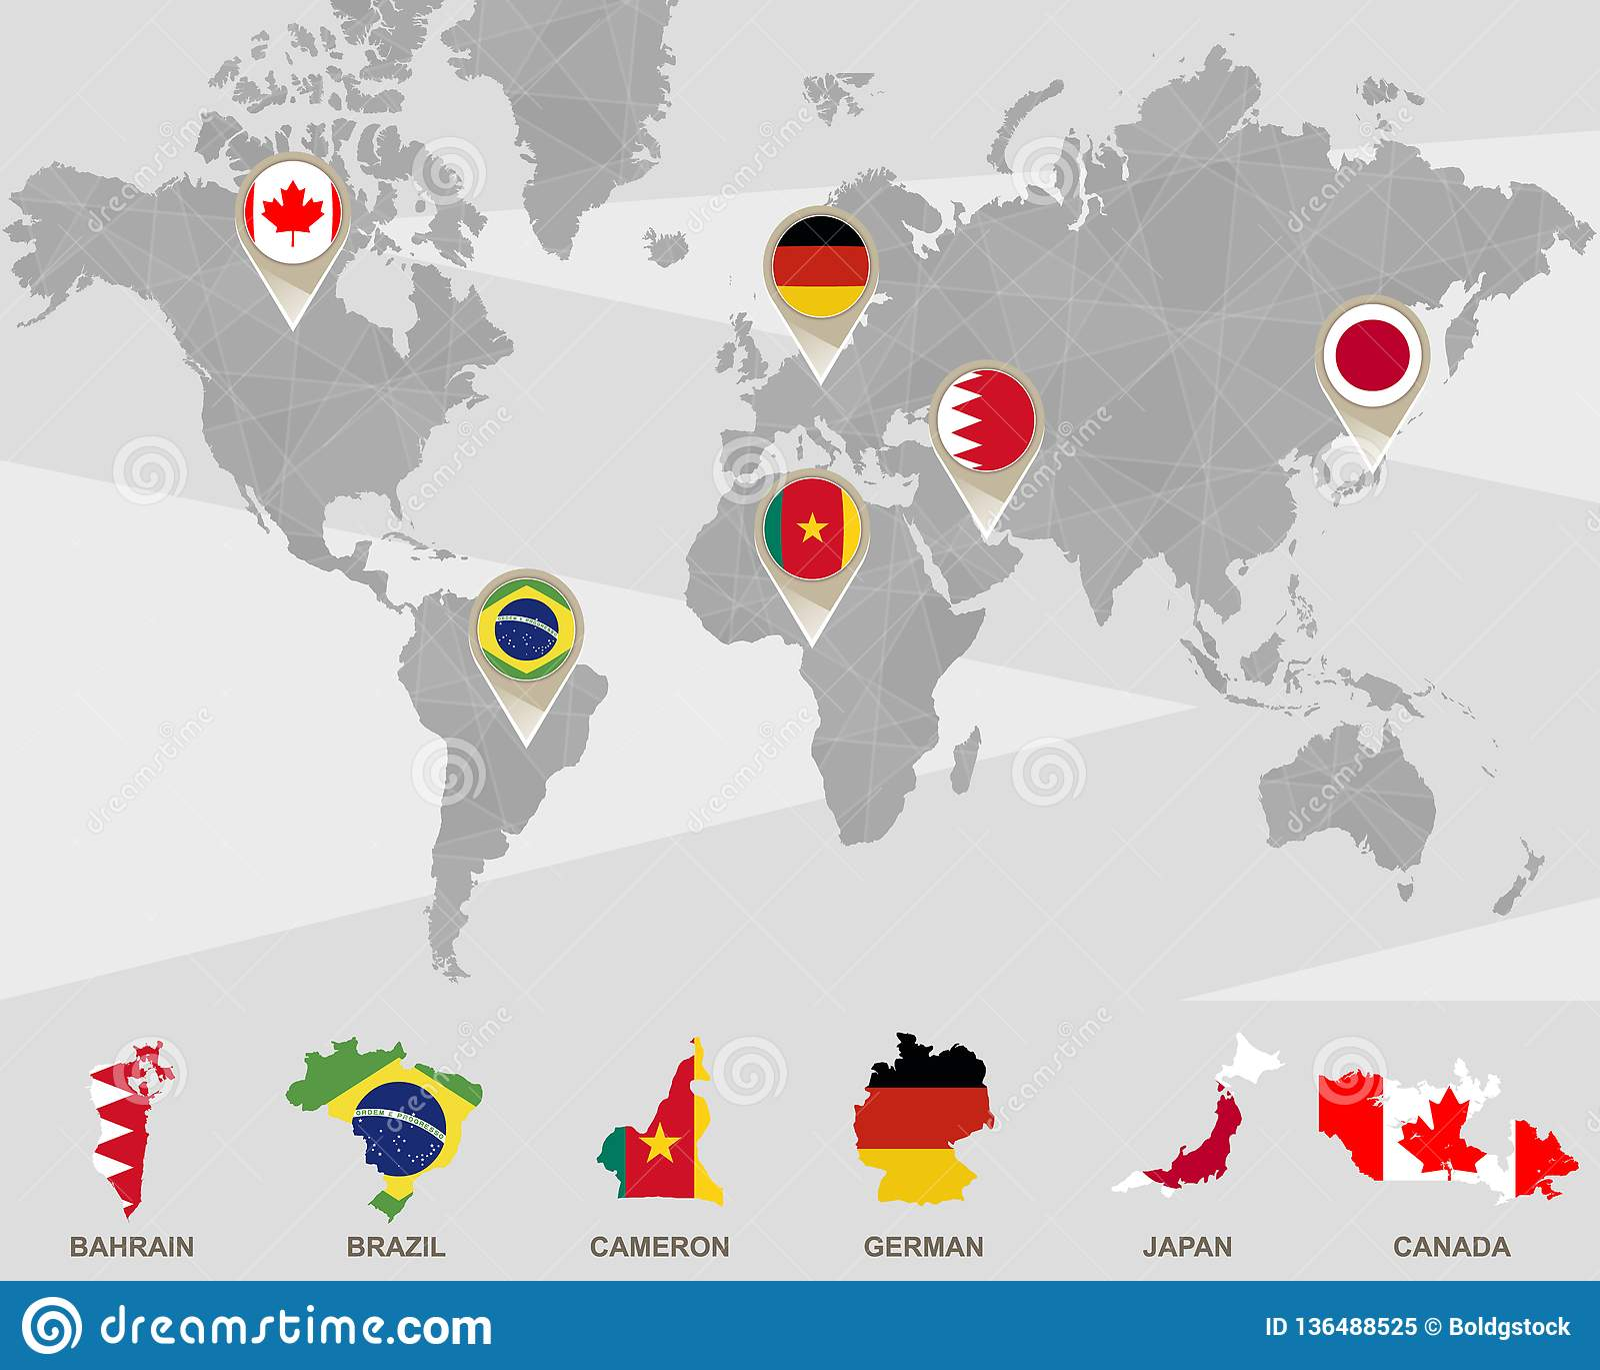 Bahrain On A World Map.World Map With Bahrain Brazil Cameron German Japan Canada